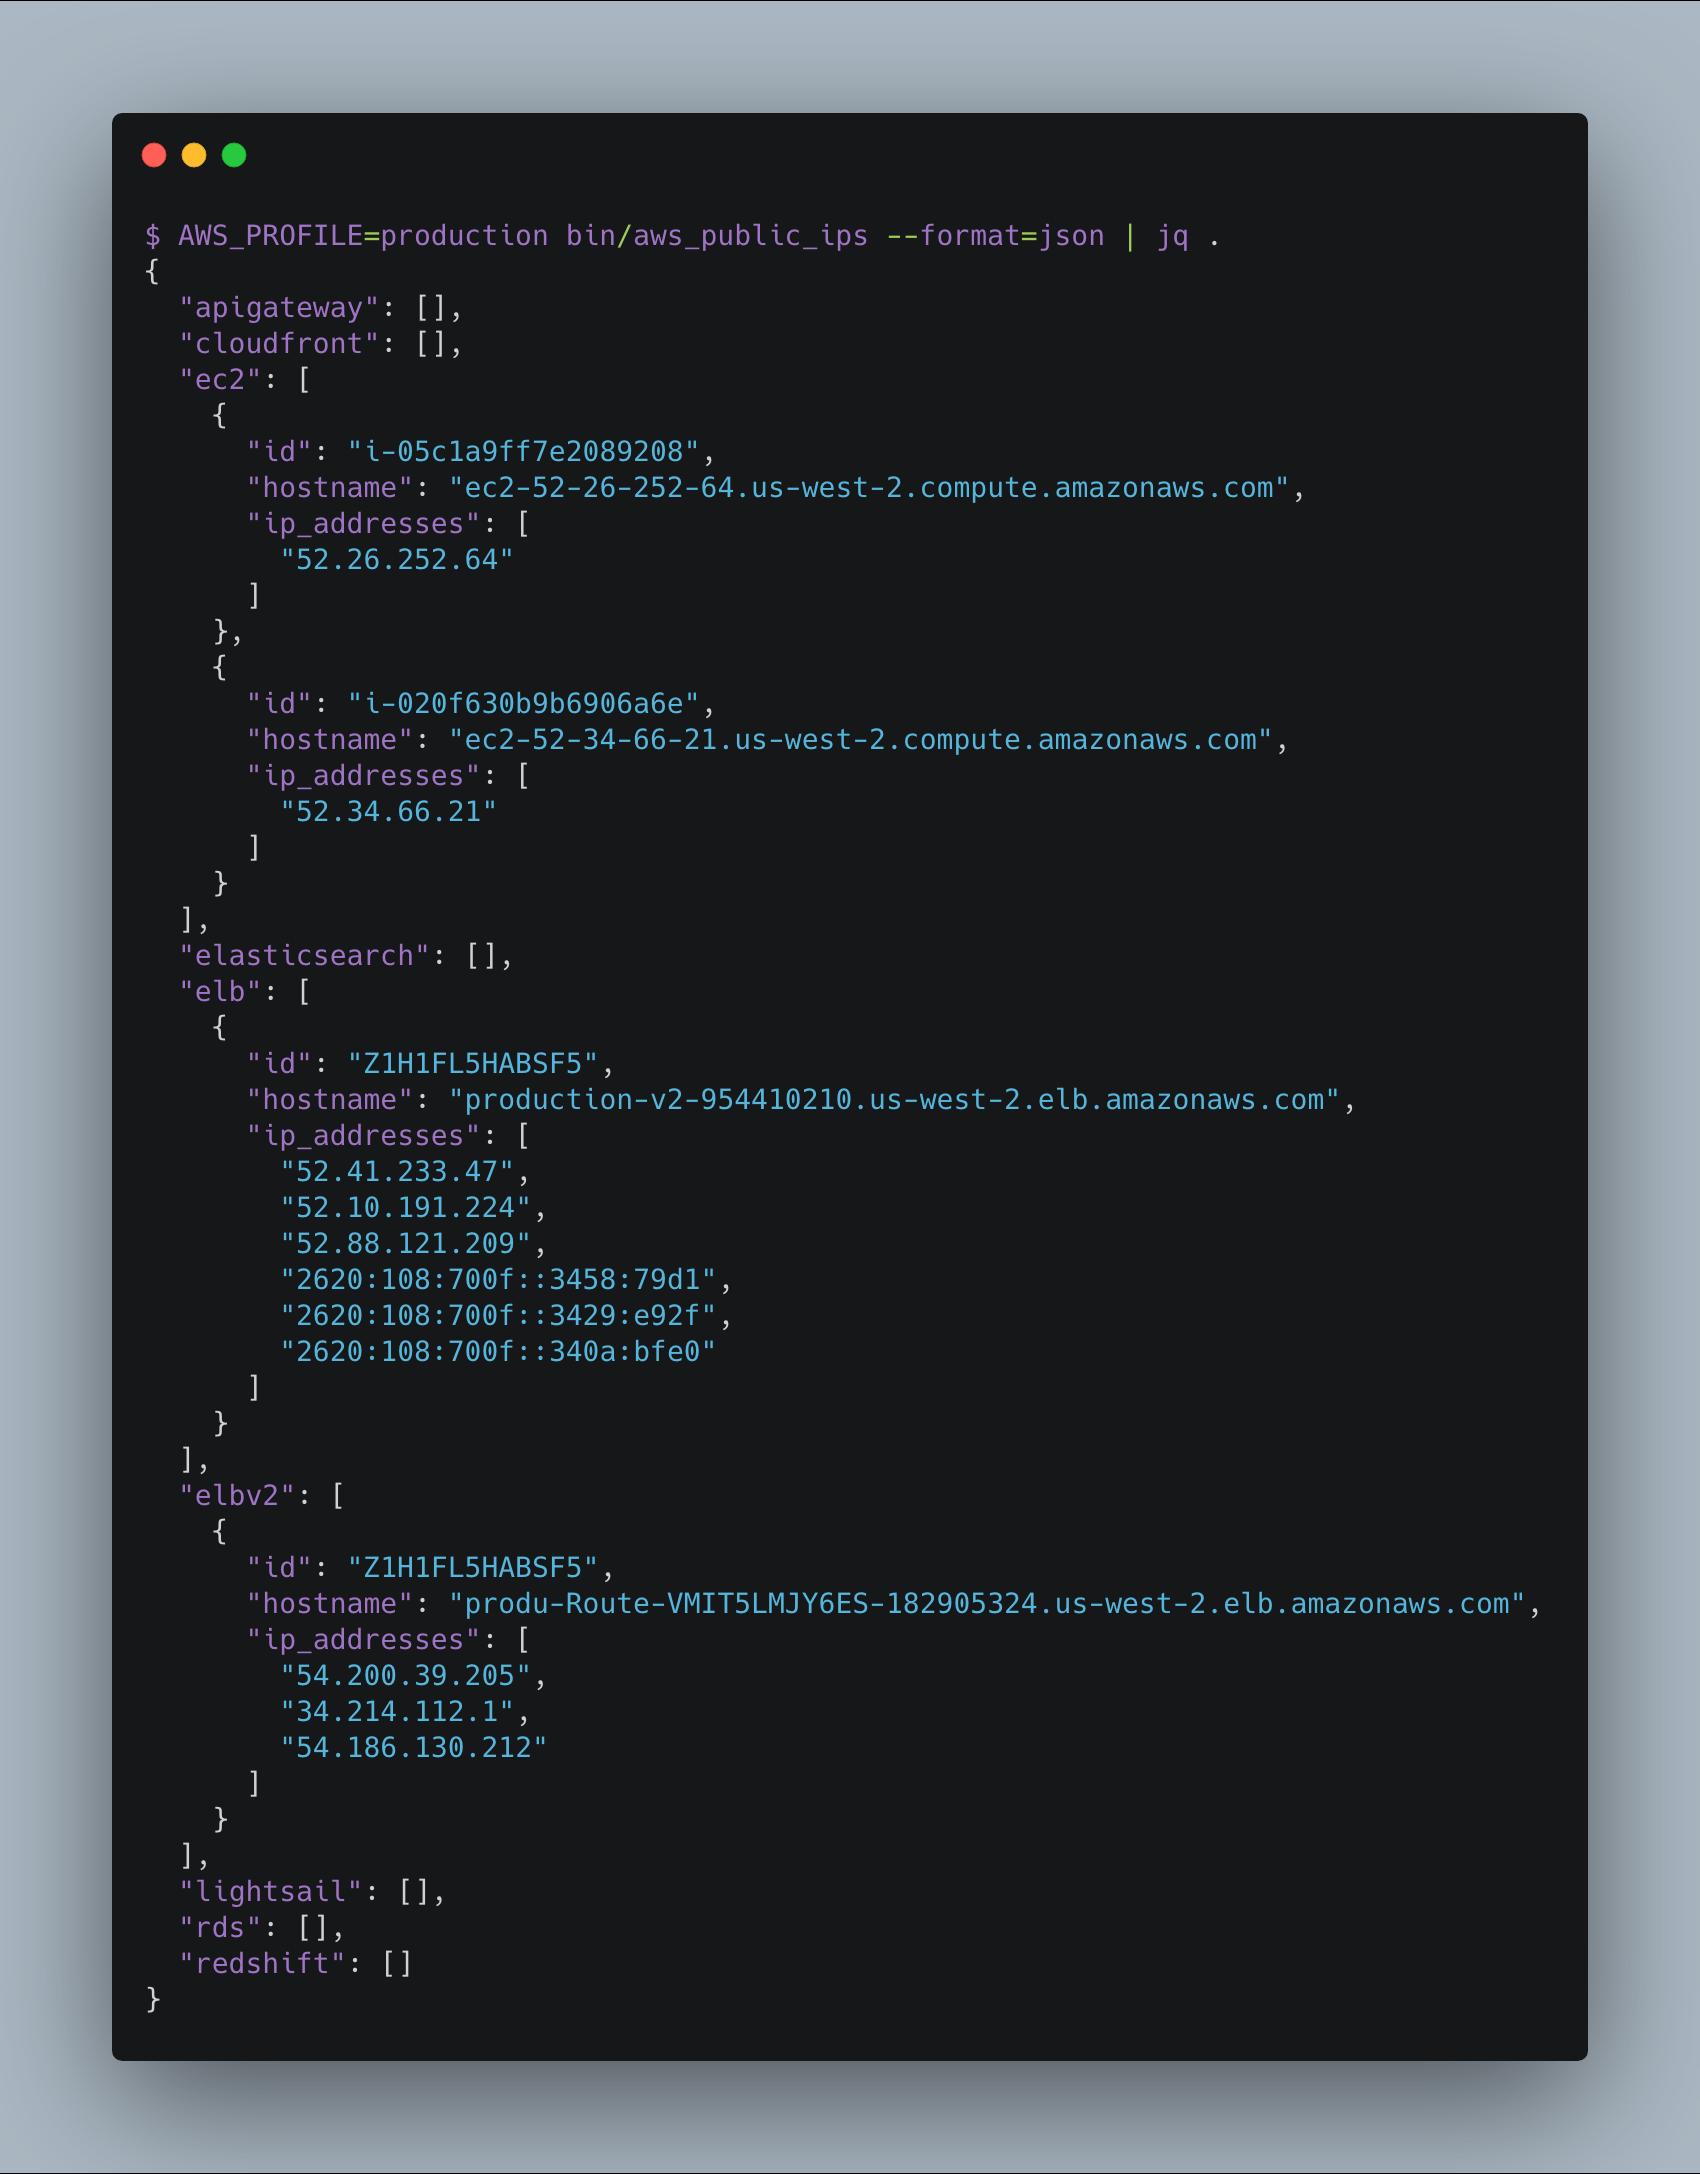 GitHub - arkadiyt/aws_public_ips: Fetch all public IP addresses tied